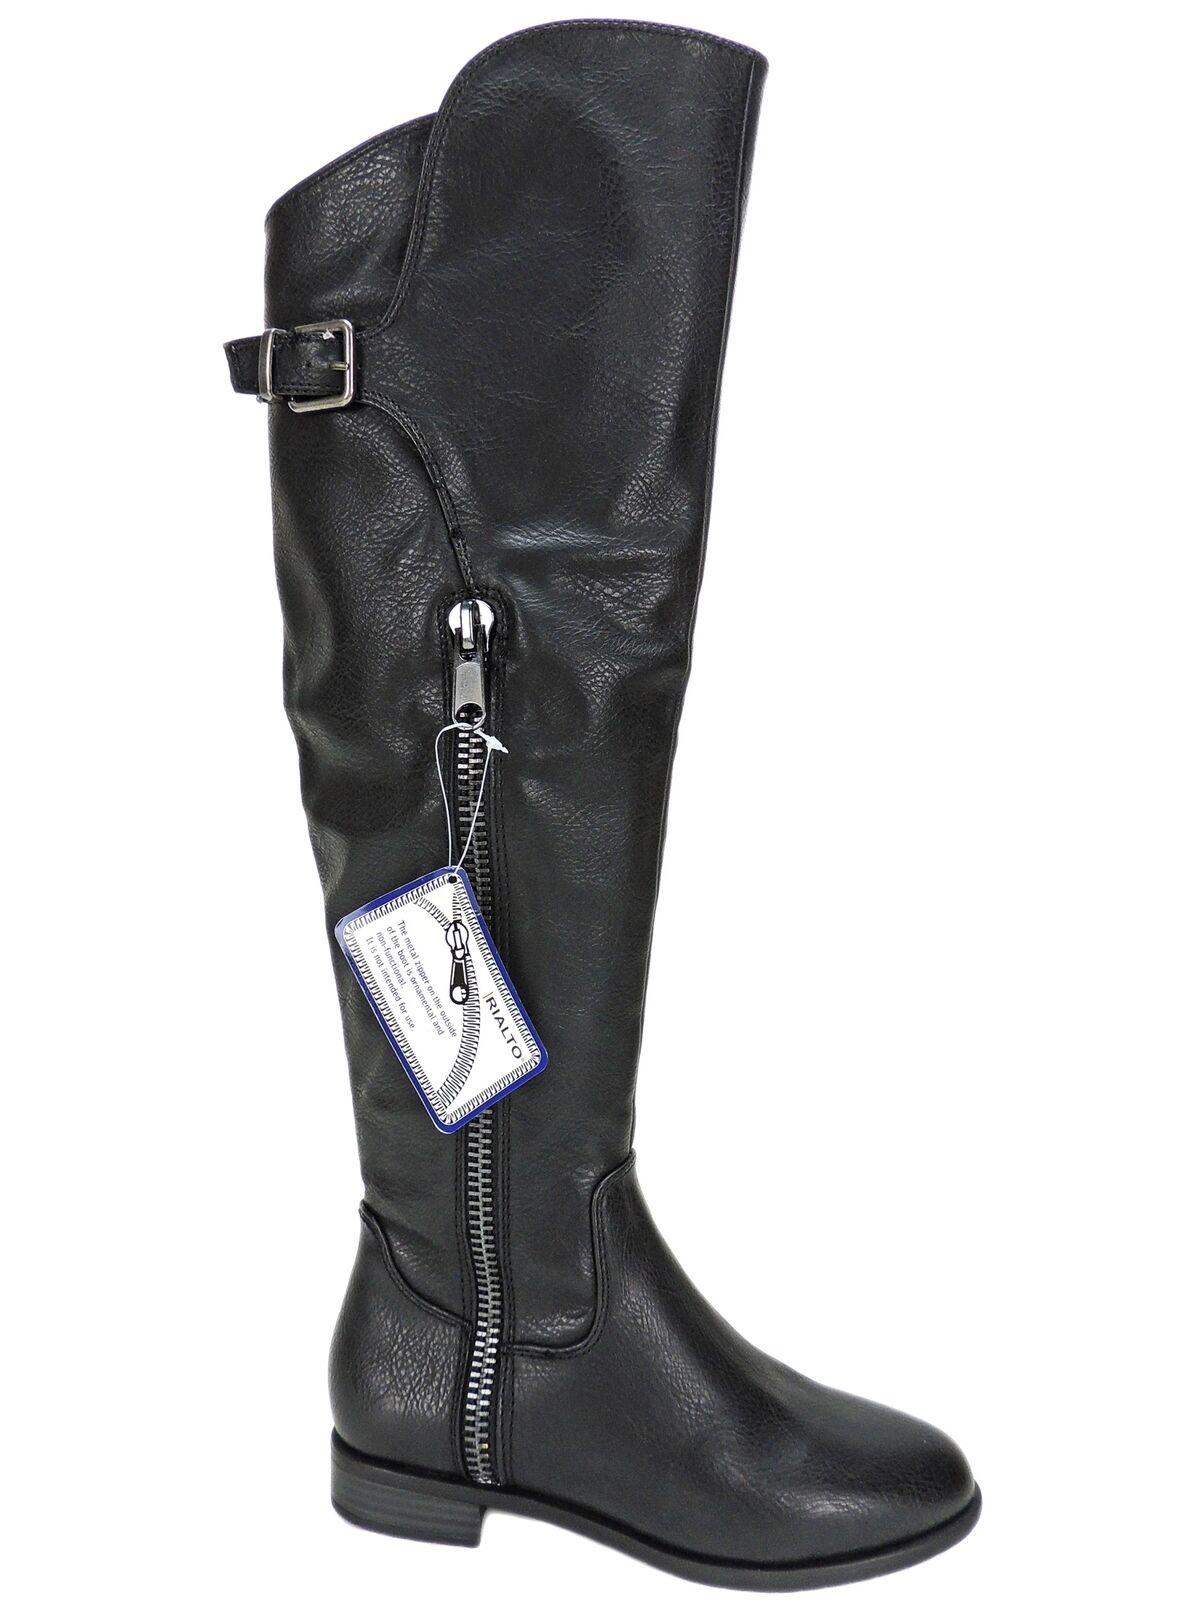 Rialto Mujer Primera fila informal informal informal sobre la rodilla botas Negras Talla 5 M  marca famosa